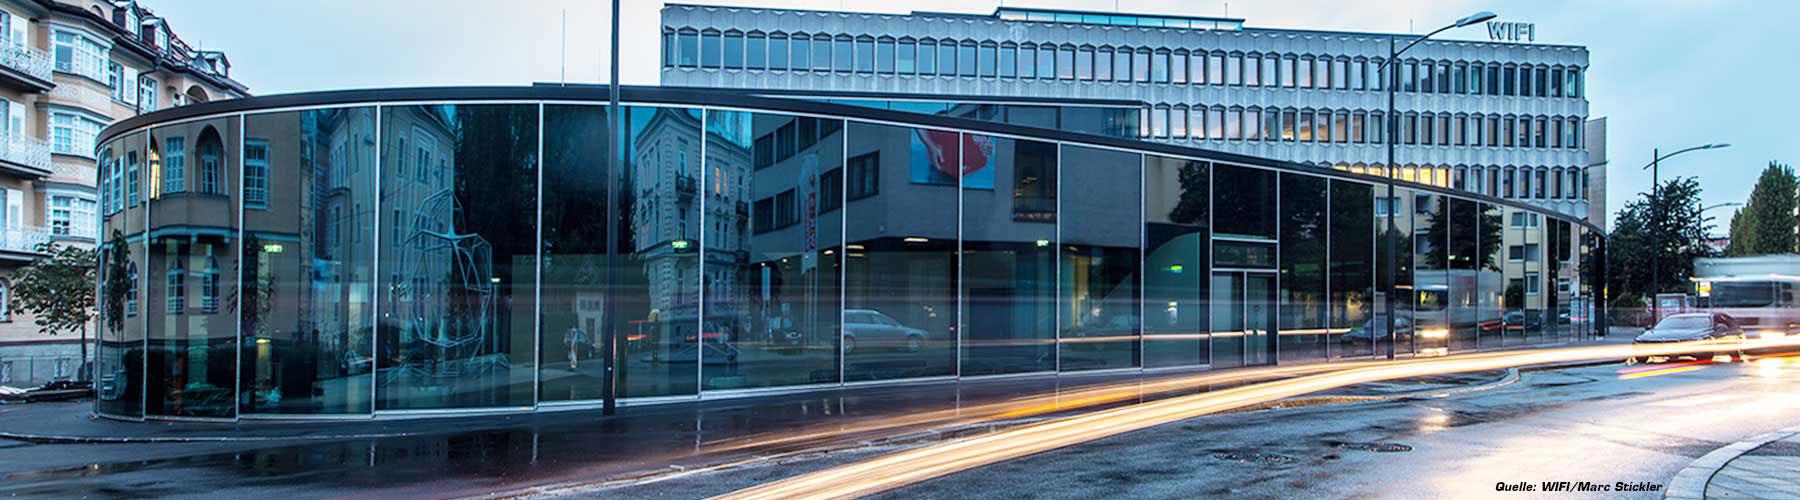 Slider Gebogene Glaeser Fassade Glasfassade Gebogen Wifi Salzburg Glasradius Esg Vsg Iso Fassade Gebogen